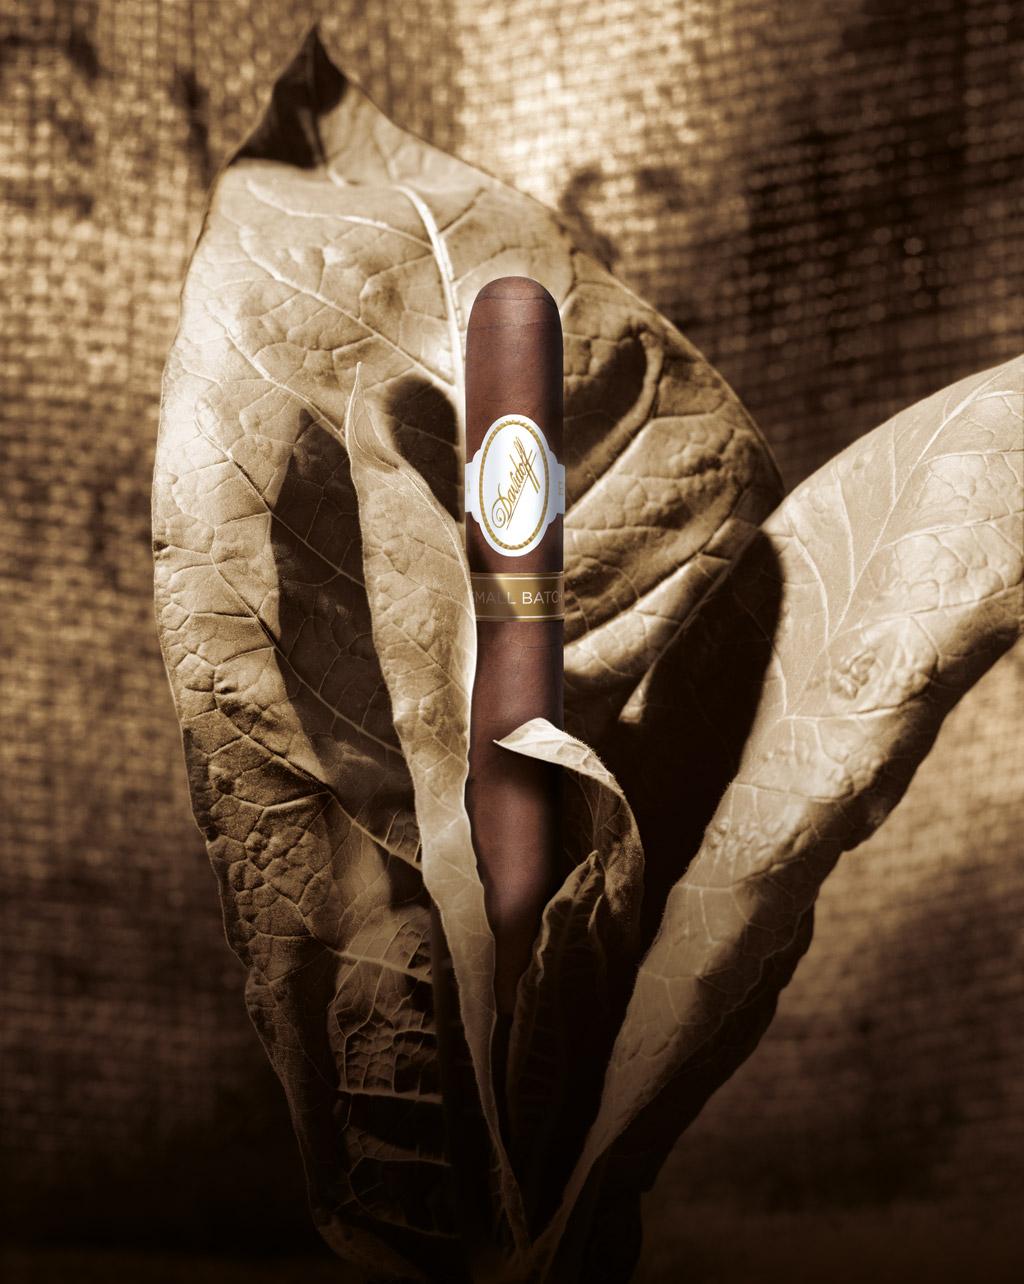 Davidoff Small Batch cigar glamour